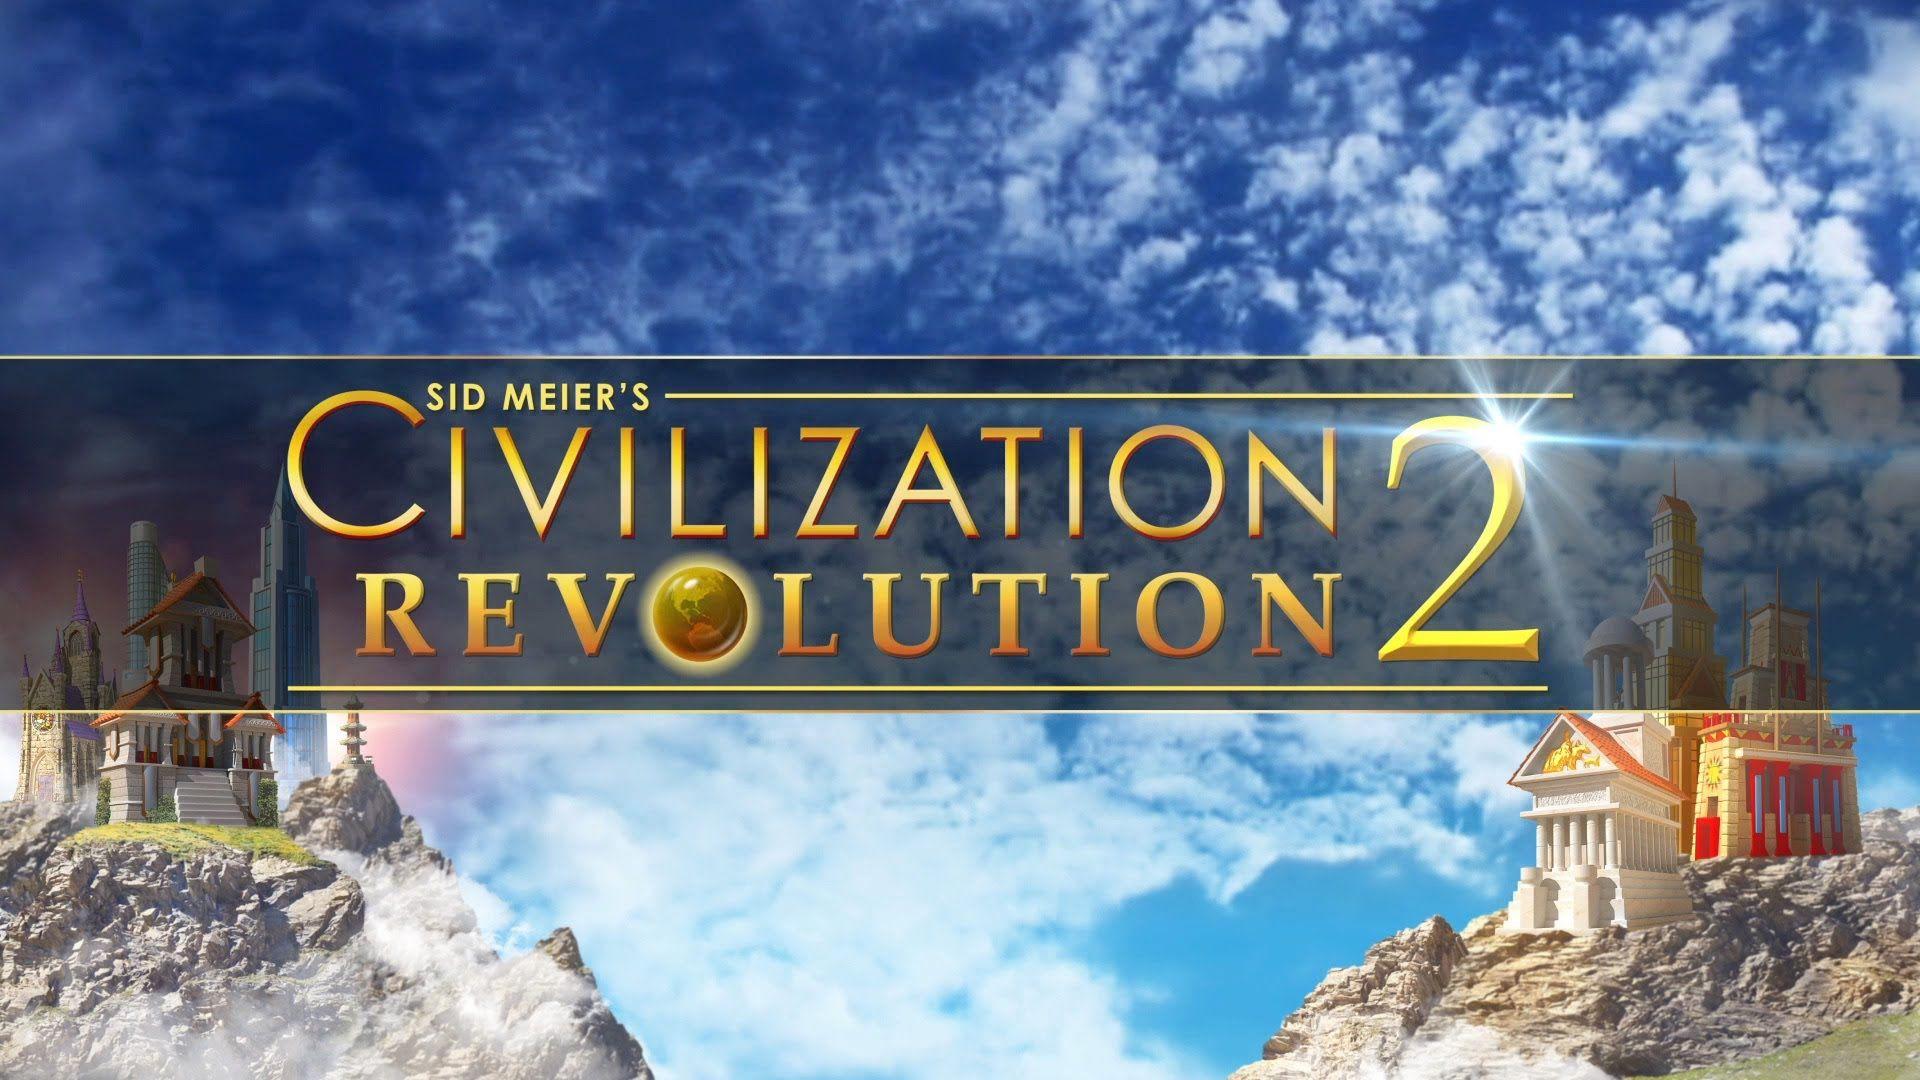 Civilization revolution 2 - £1.89 @ Google Play Store